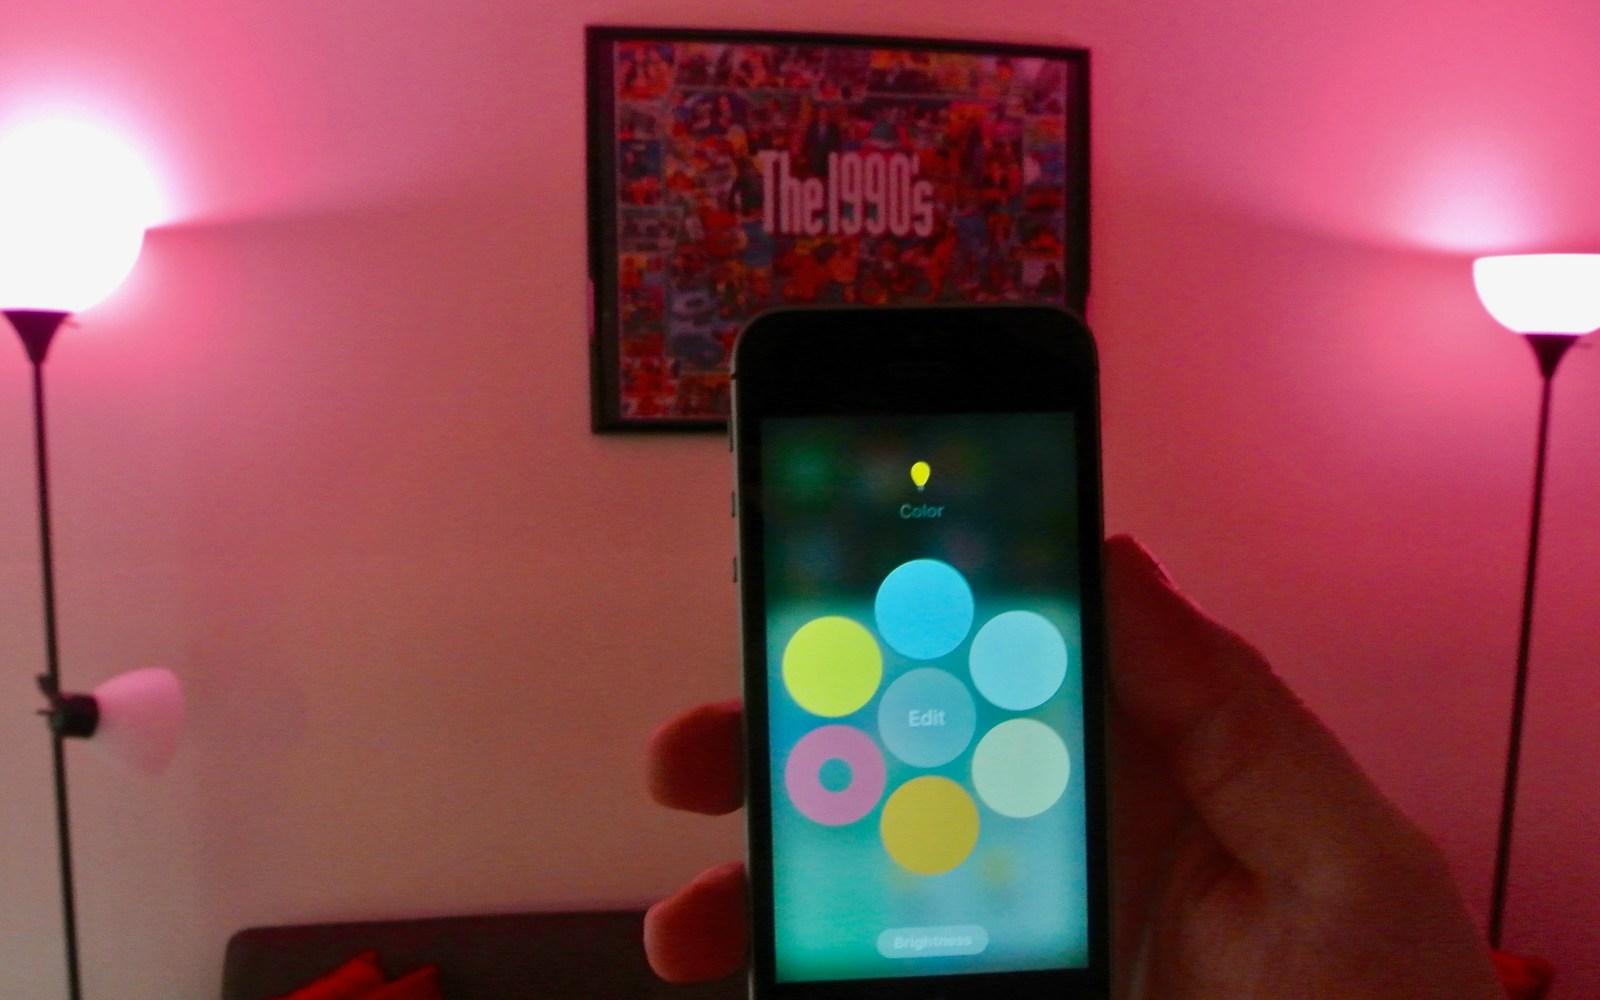 Hands-on: iOS 10 + watchOS 3 Home app for HomeKit on iPhone, iPad, & Apple Watch